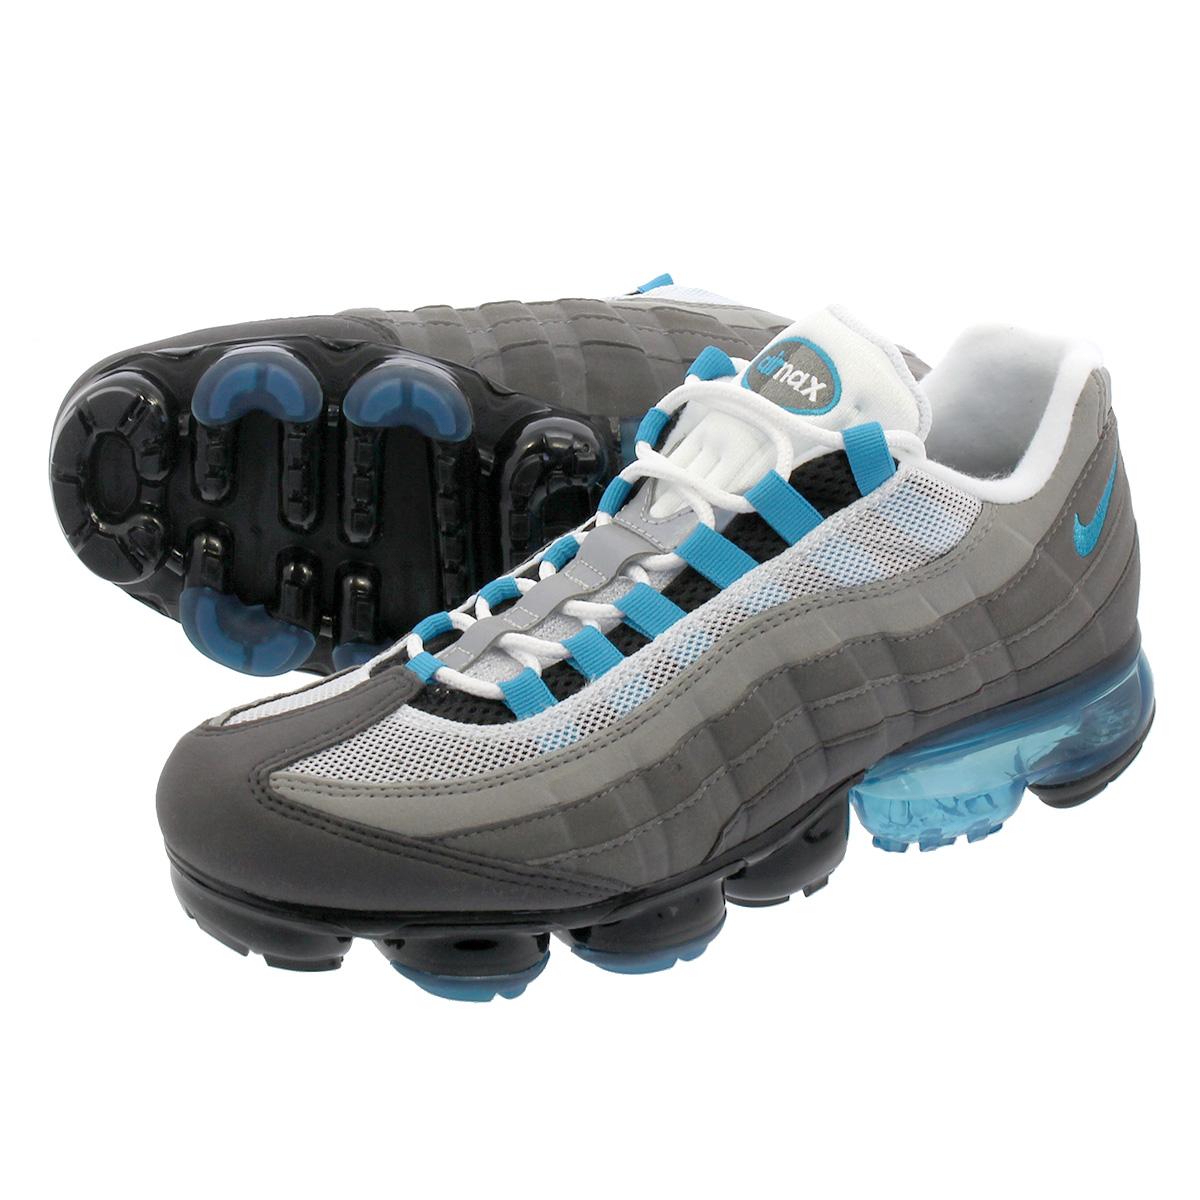 best sneakers 53fdb 5e67d NIKE AIR VAPORMAX 95 Nike air vapor max 95 BLACK/NEO TURQ/MEDIUM ASH/DARK  PEWTER aj7292-002